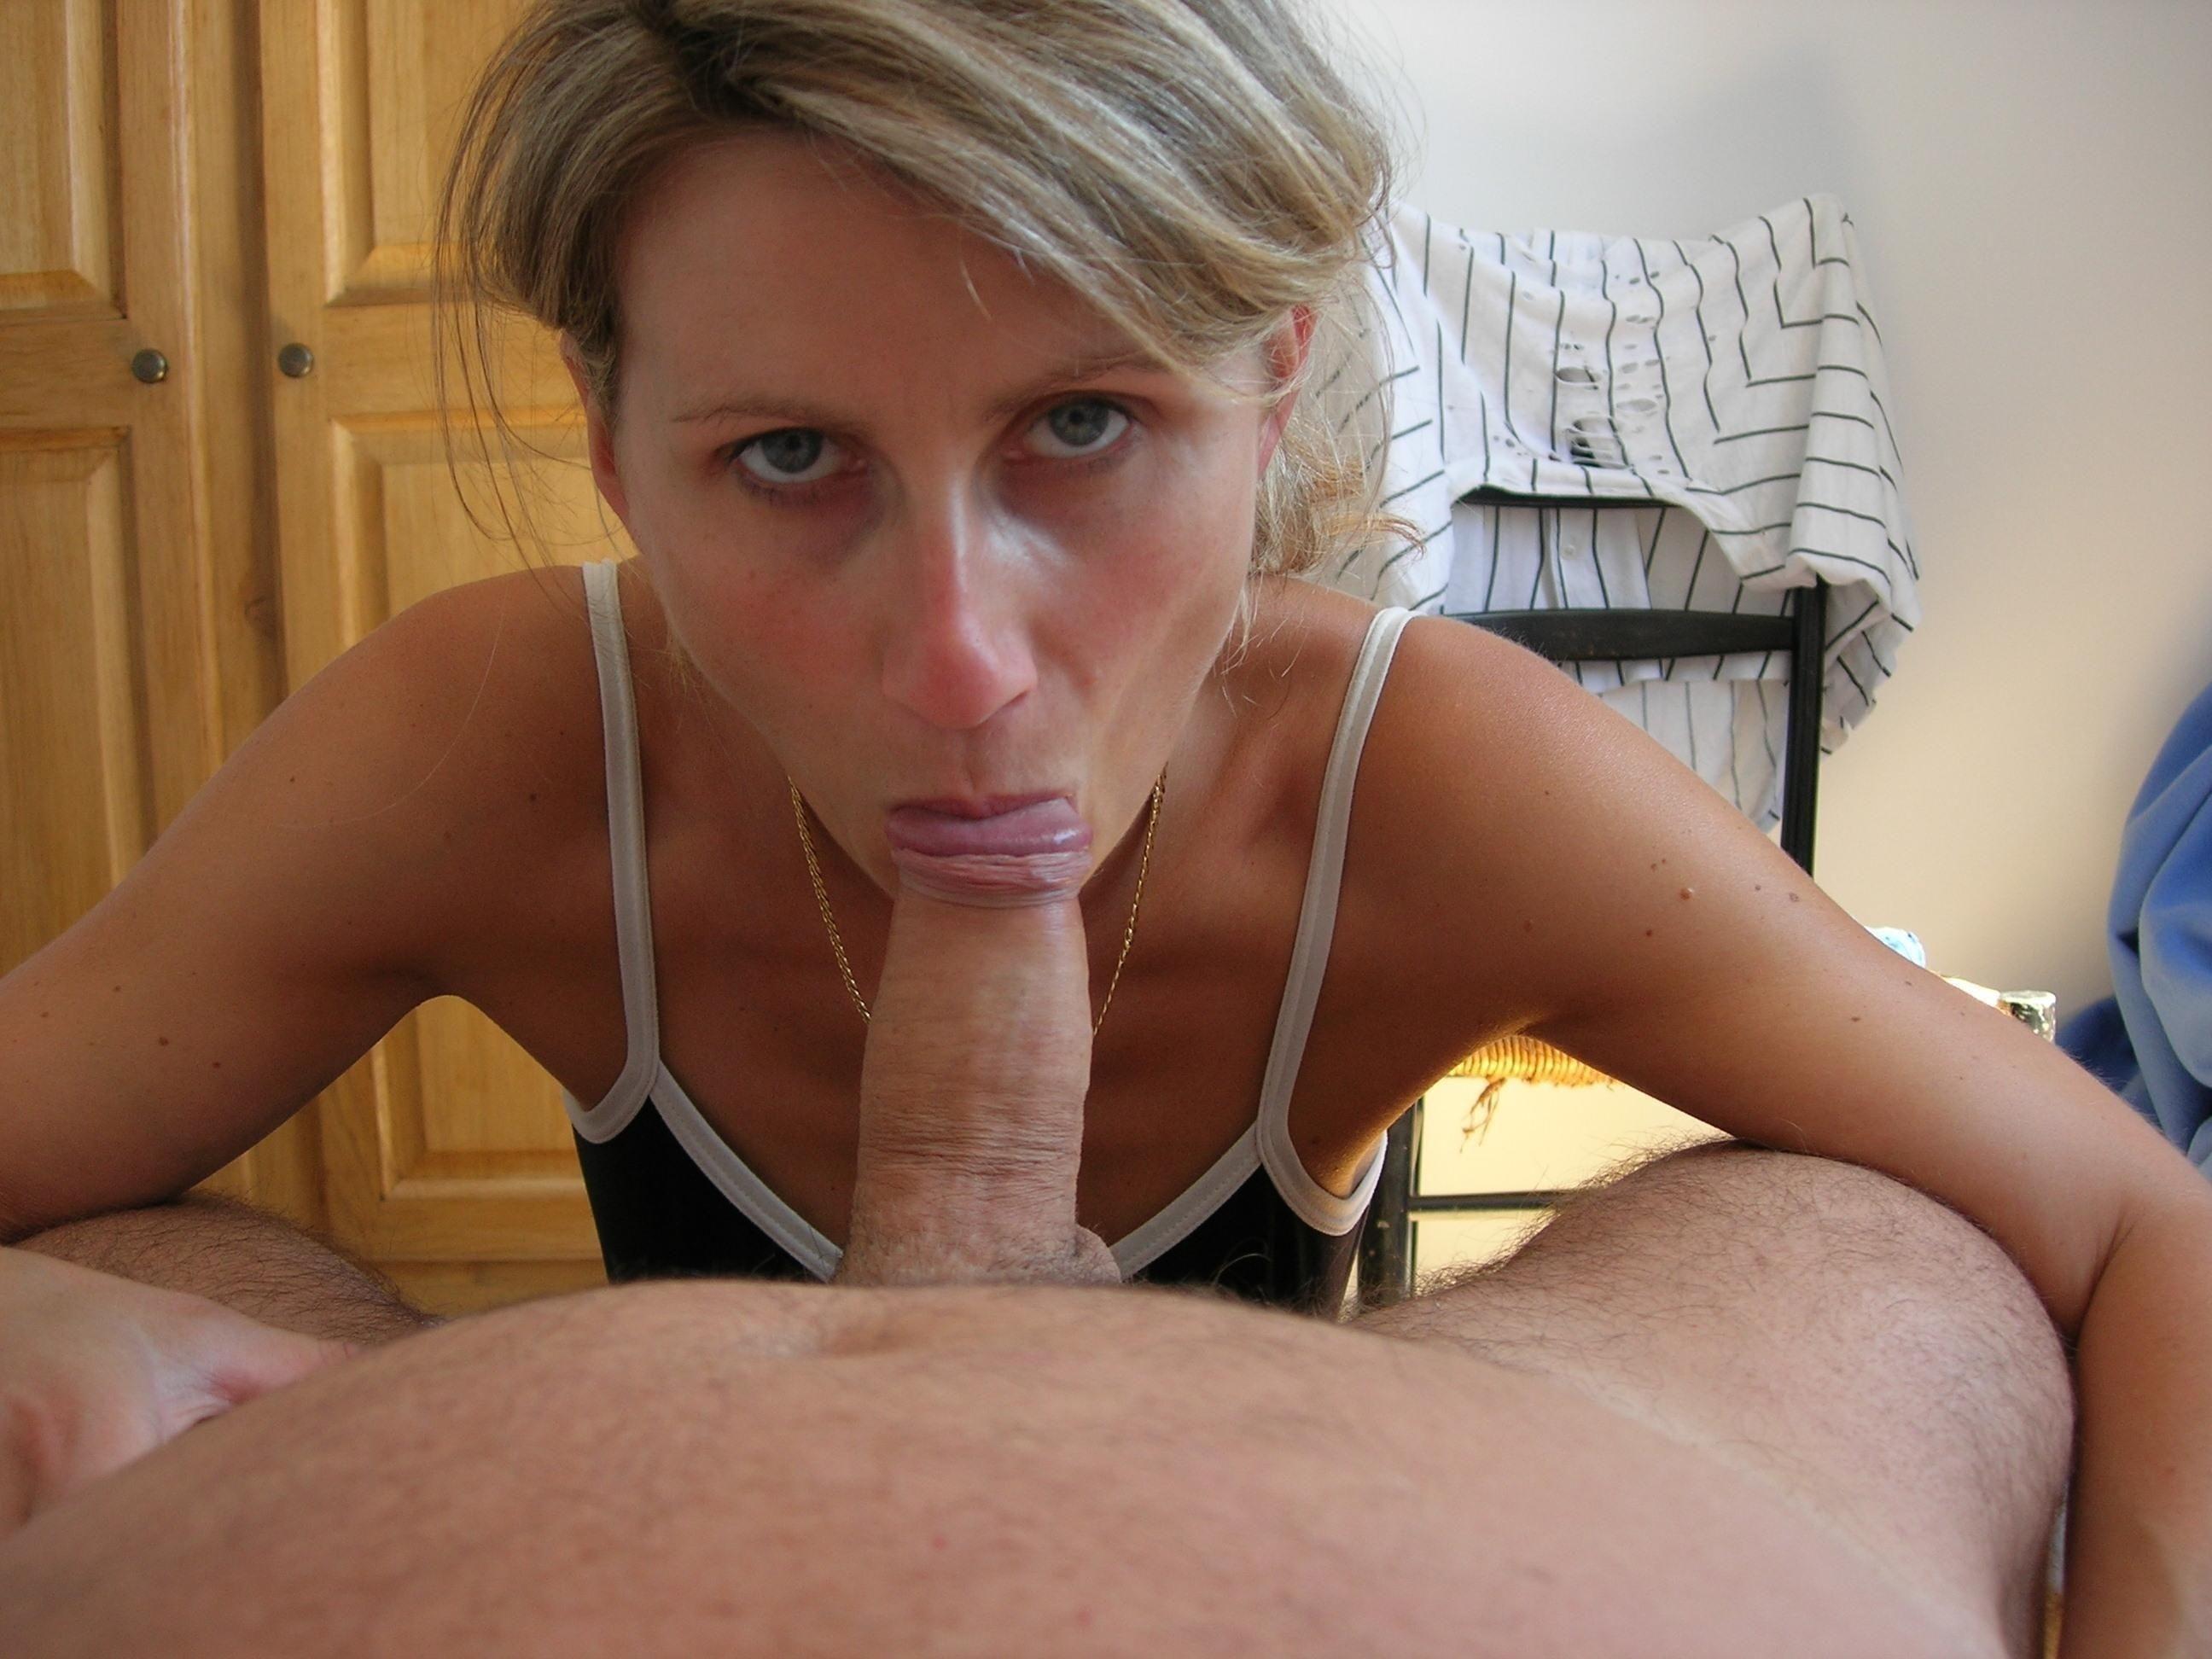 deepthroat-horny-wife-blowjob-caption-pics-and-movies